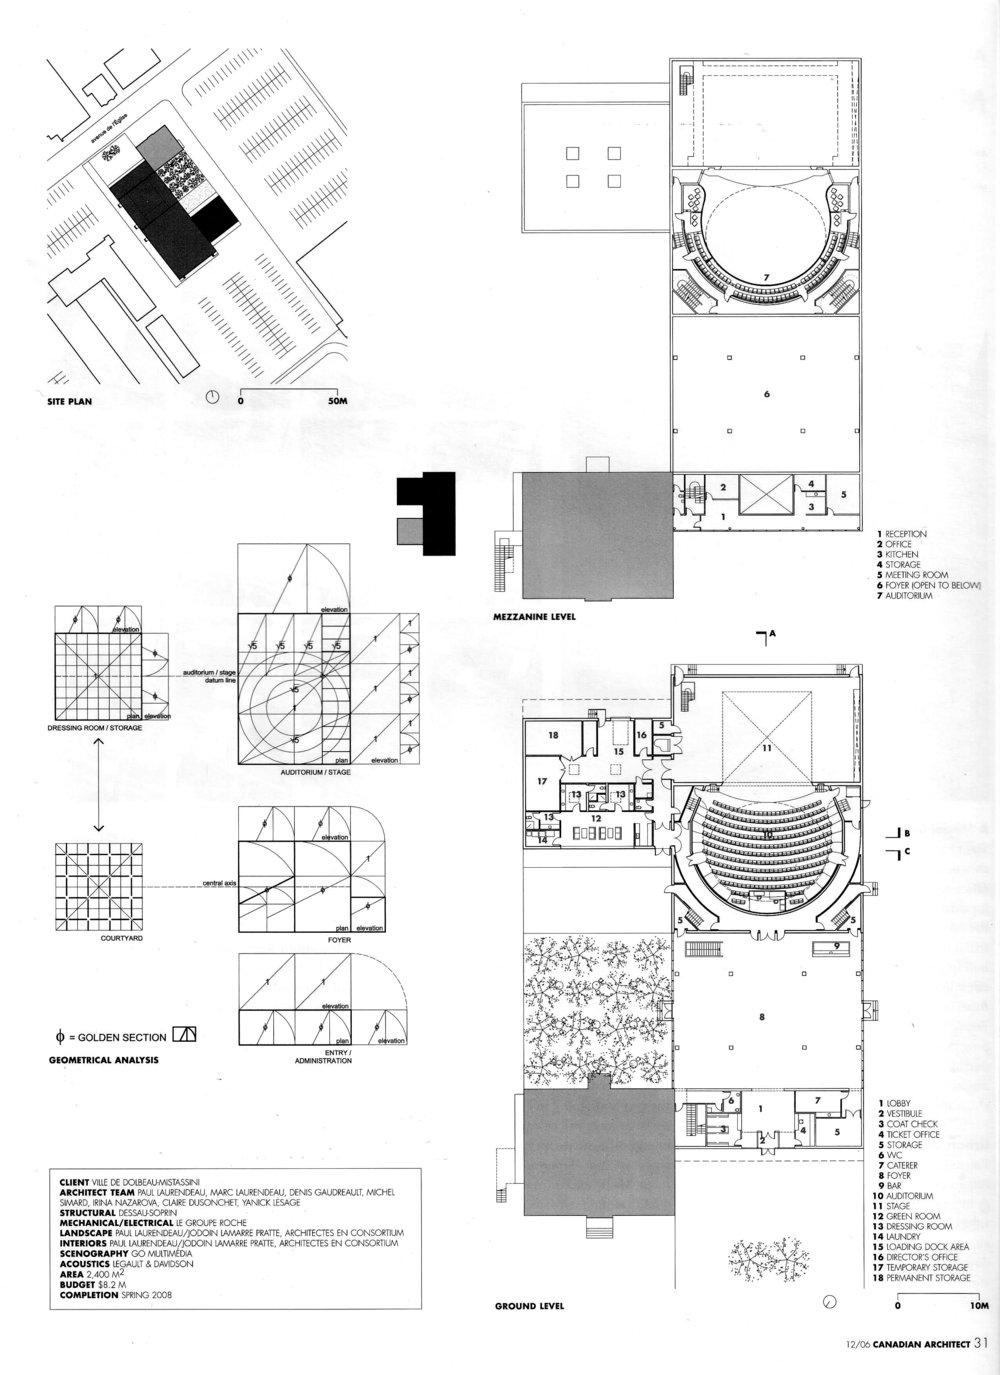 2006-12 dolb-ca51-1 p5.jpg